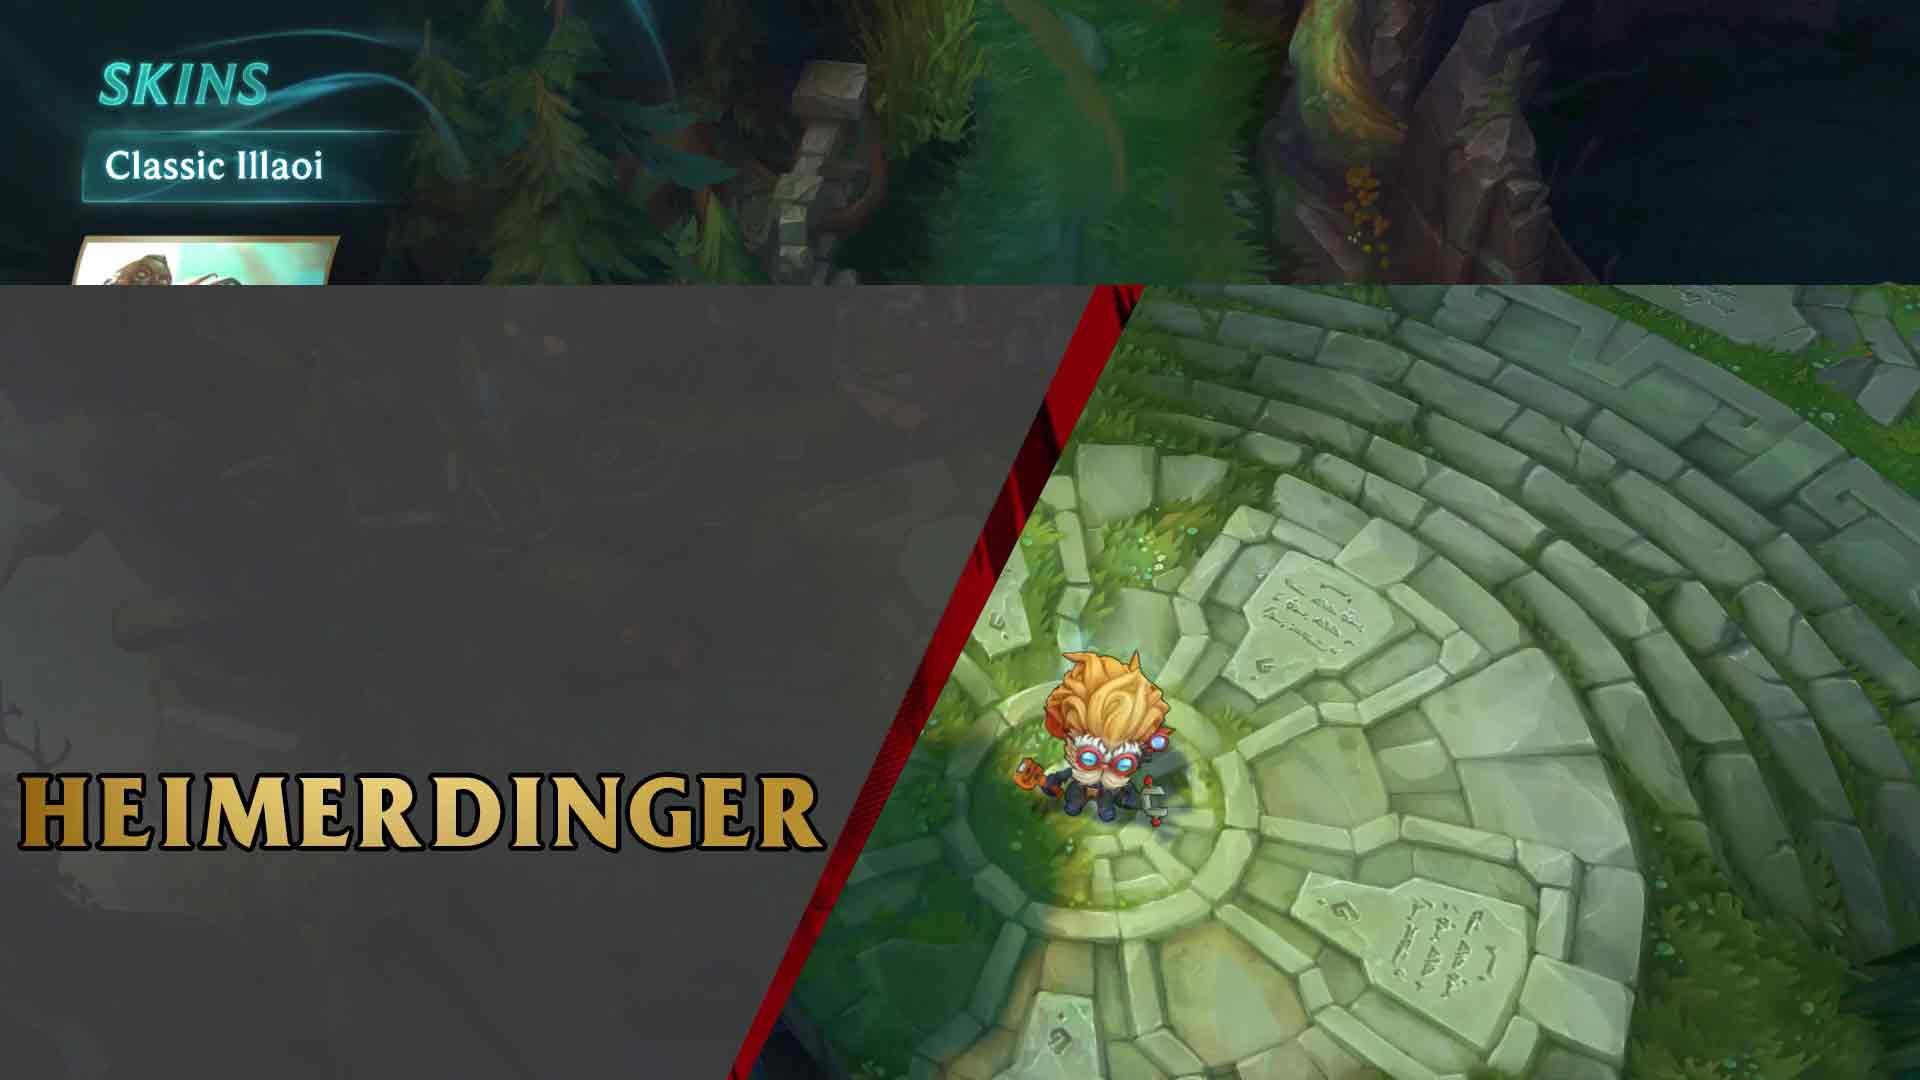 Heimerdinger-LOL-นักวิทยาศาสตร์สติเฟื่อง2